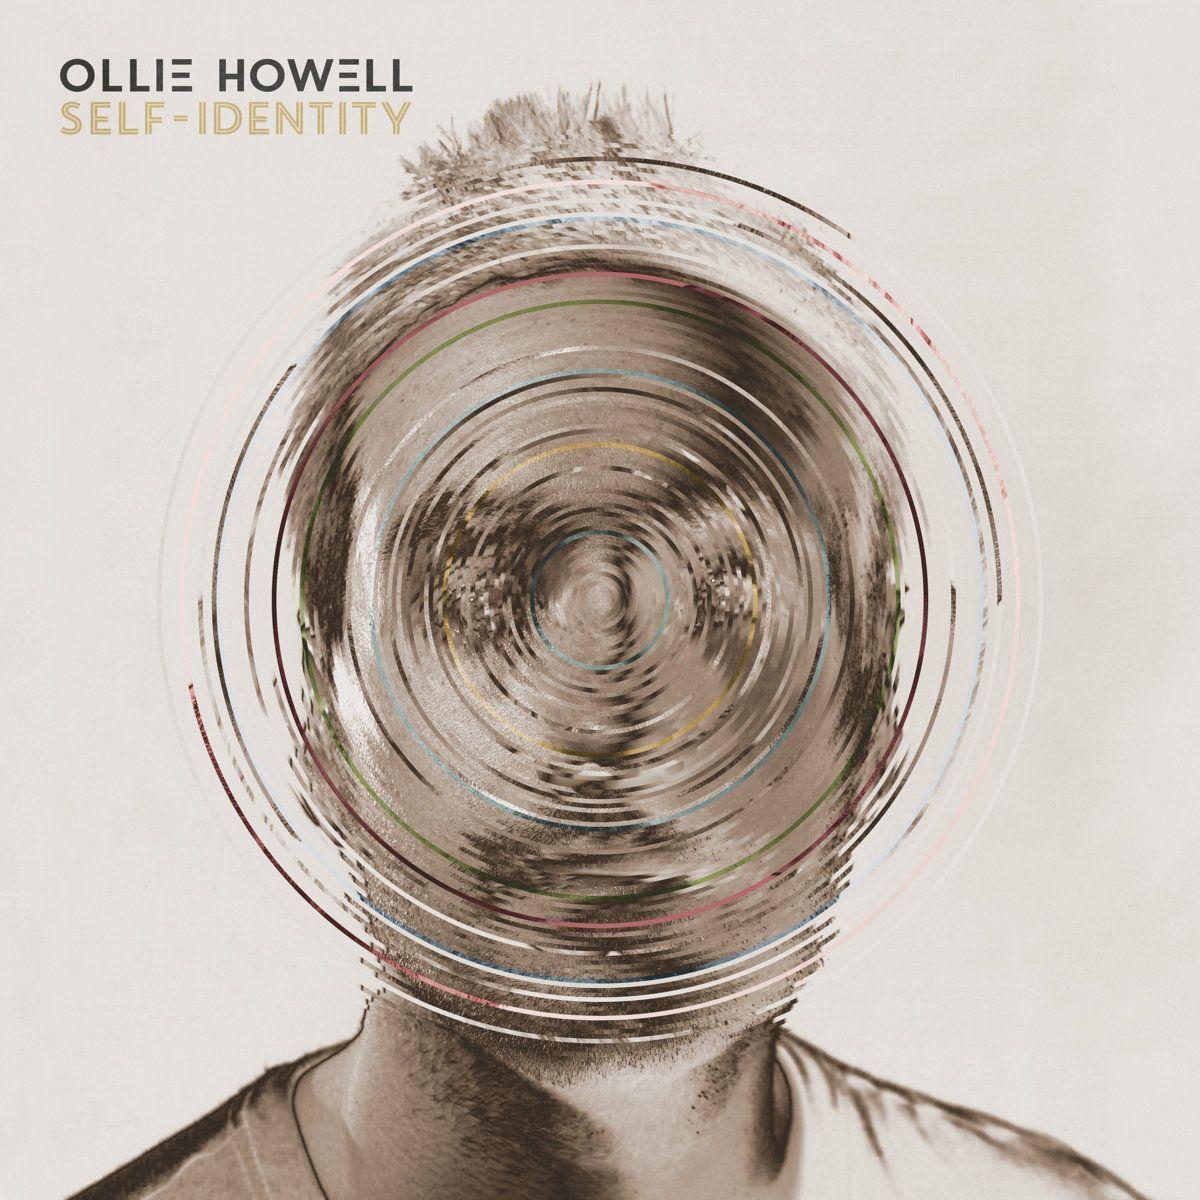 Ollie Howell: Self-identity